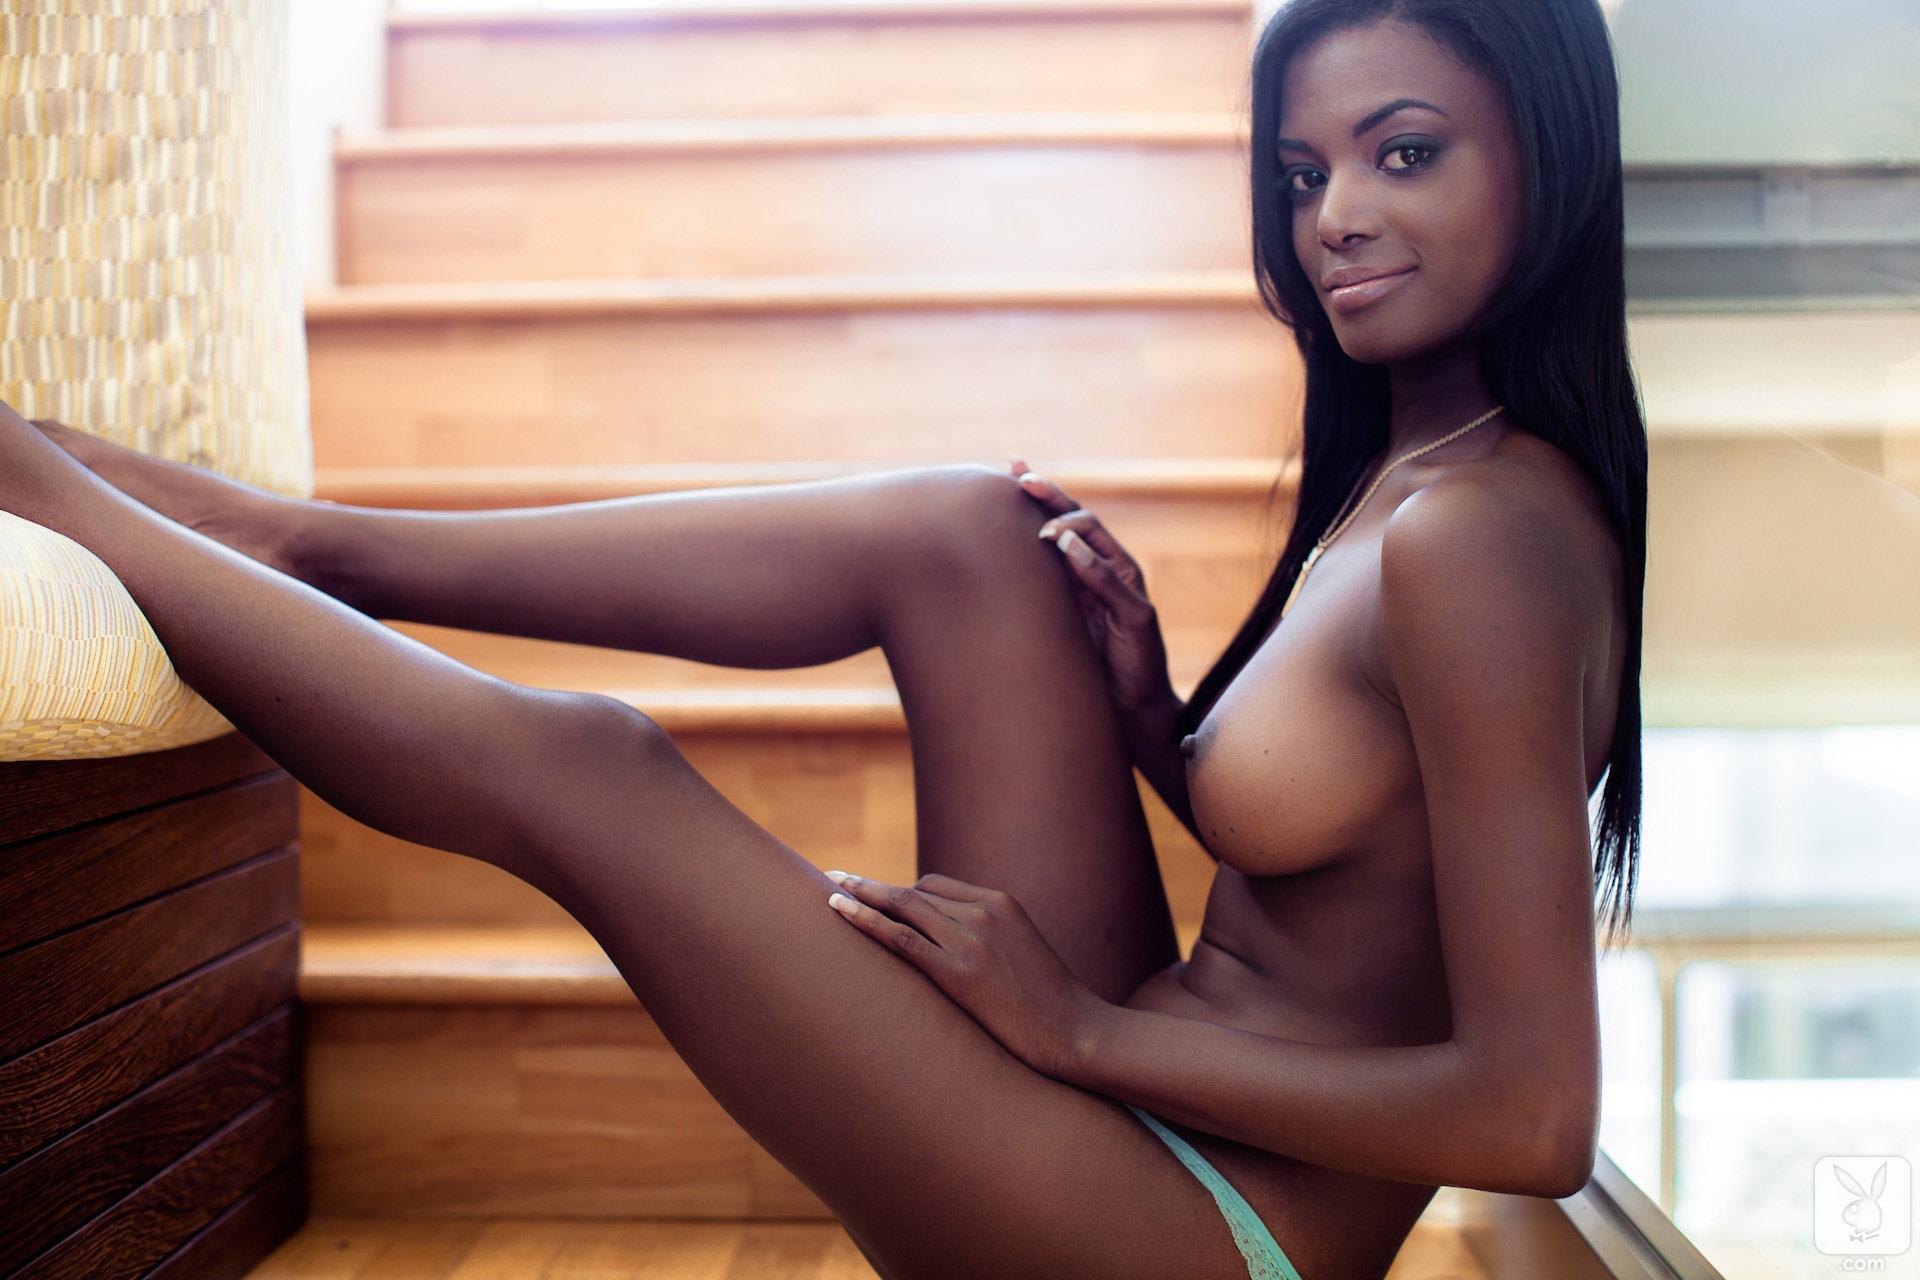 danielle-nicole-naked-ebony-rooftop-honey-bikini-playboy-16